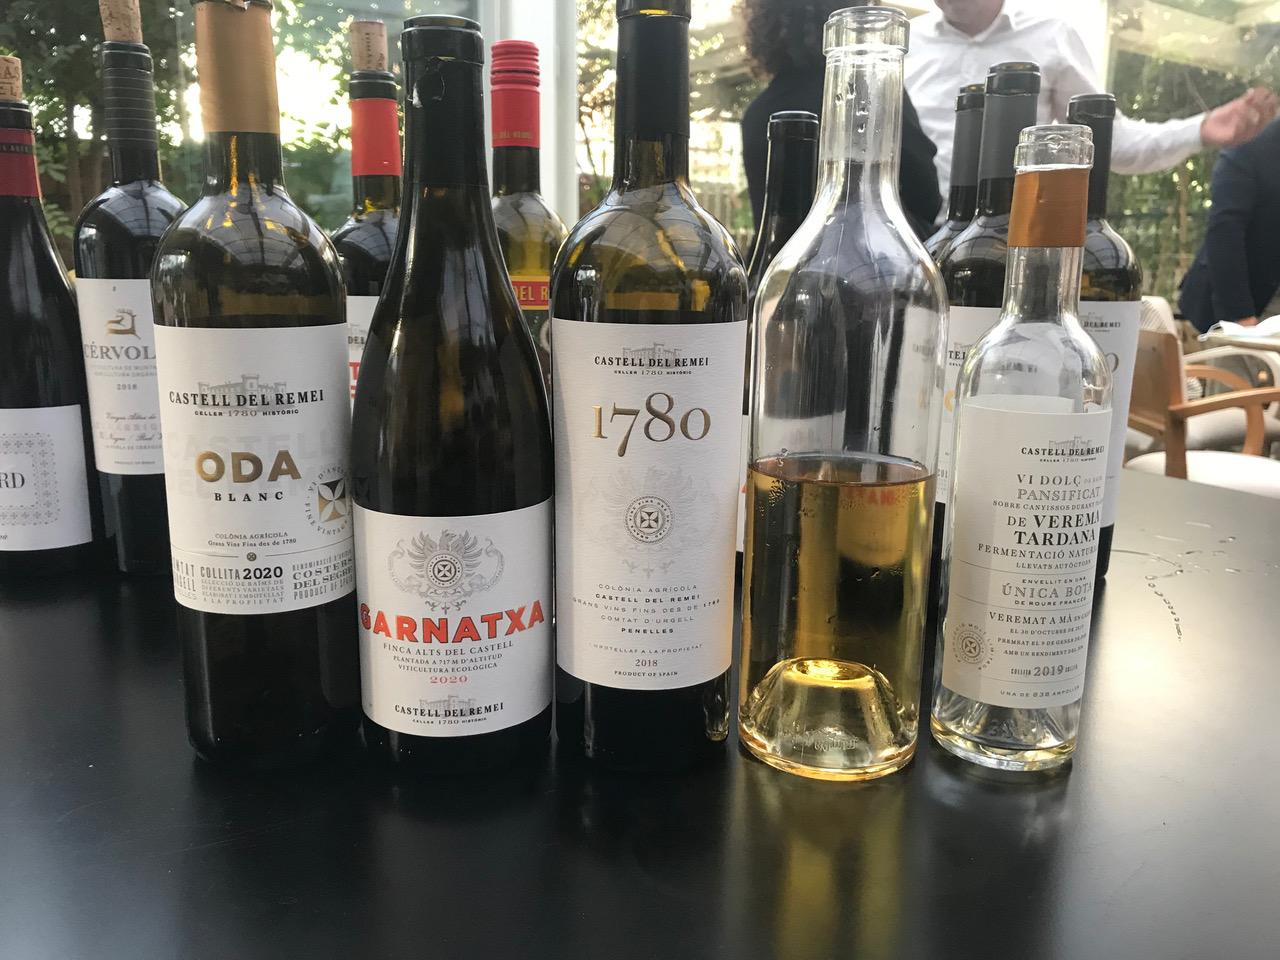 Diverses referències de vins de Castell del Remei   R.R.